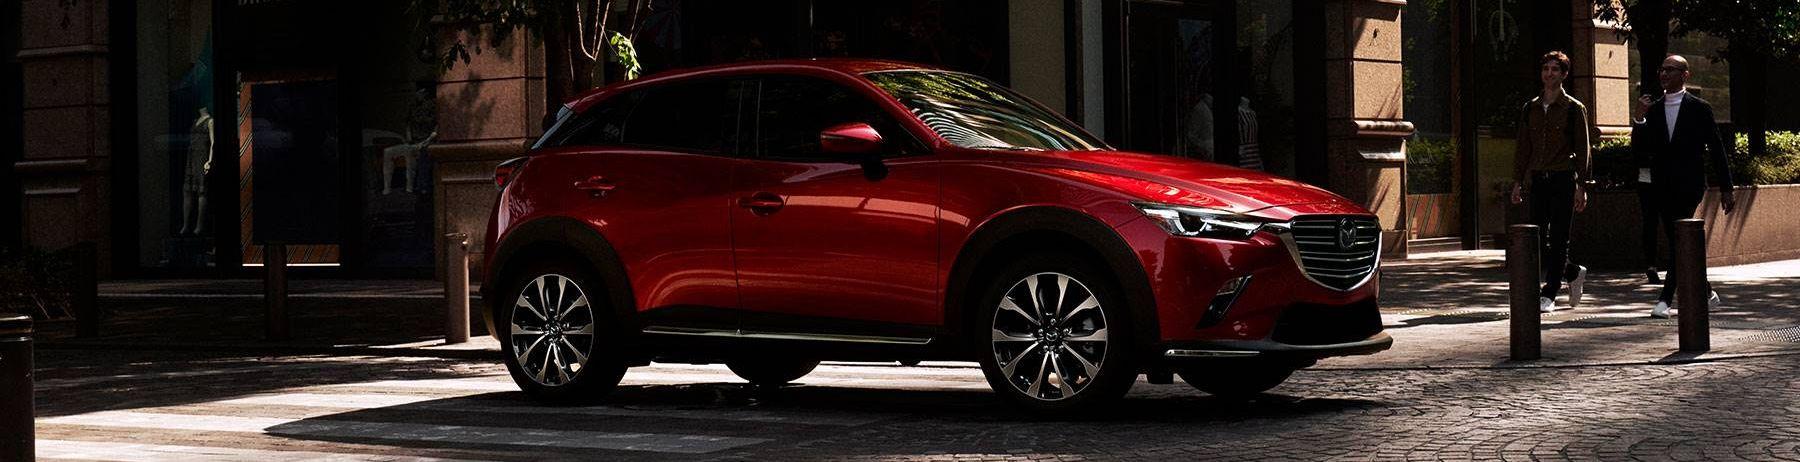 2019 Mazda CX-3 Financing in Monroe, LA